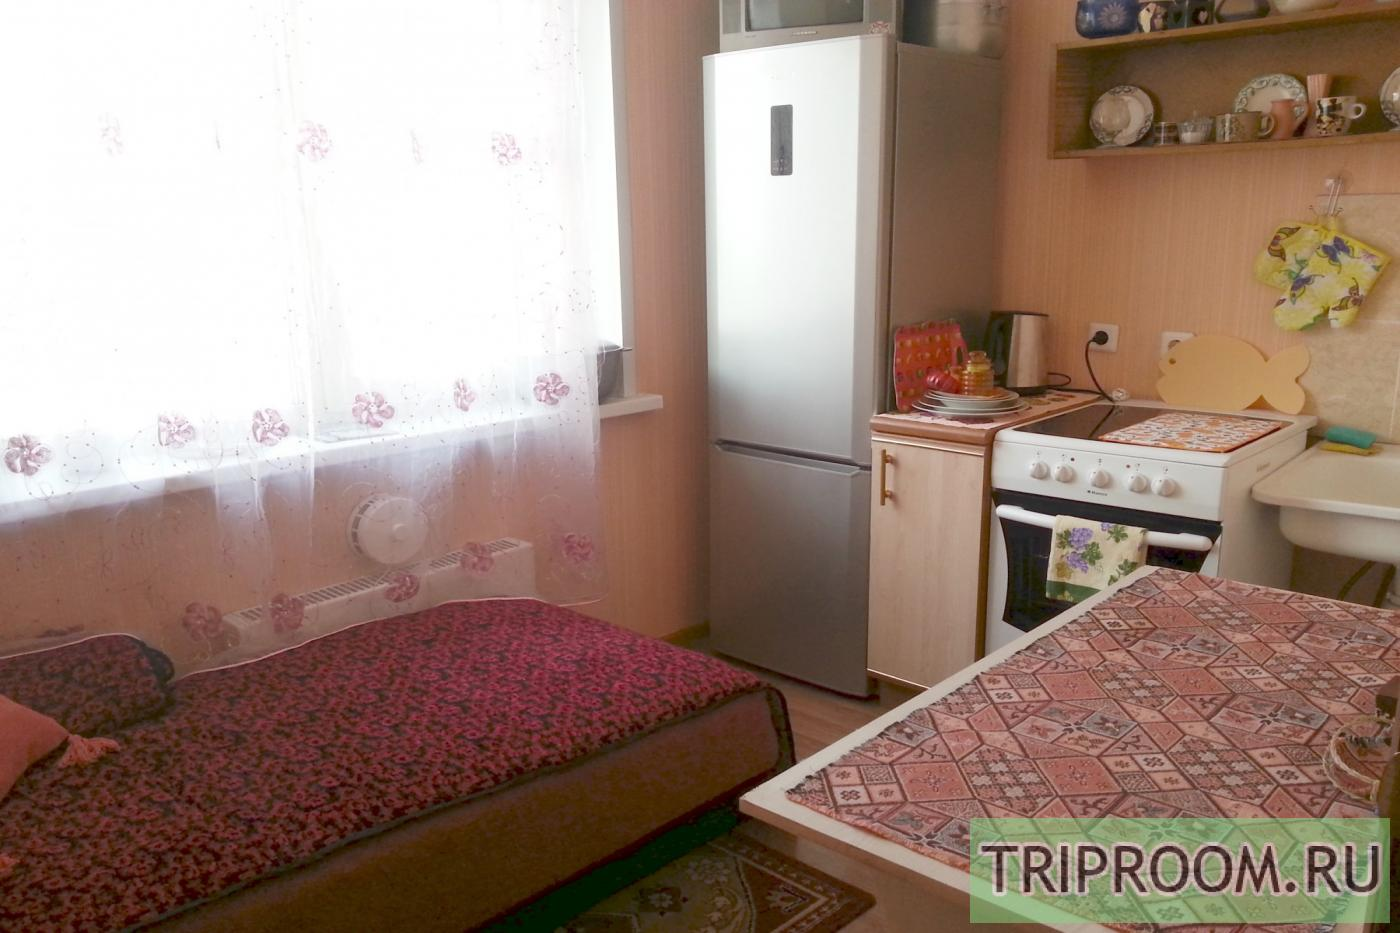 1-комнатная квартира посуточно (вариант № 30847), ул. Строителей улица, фото № 2